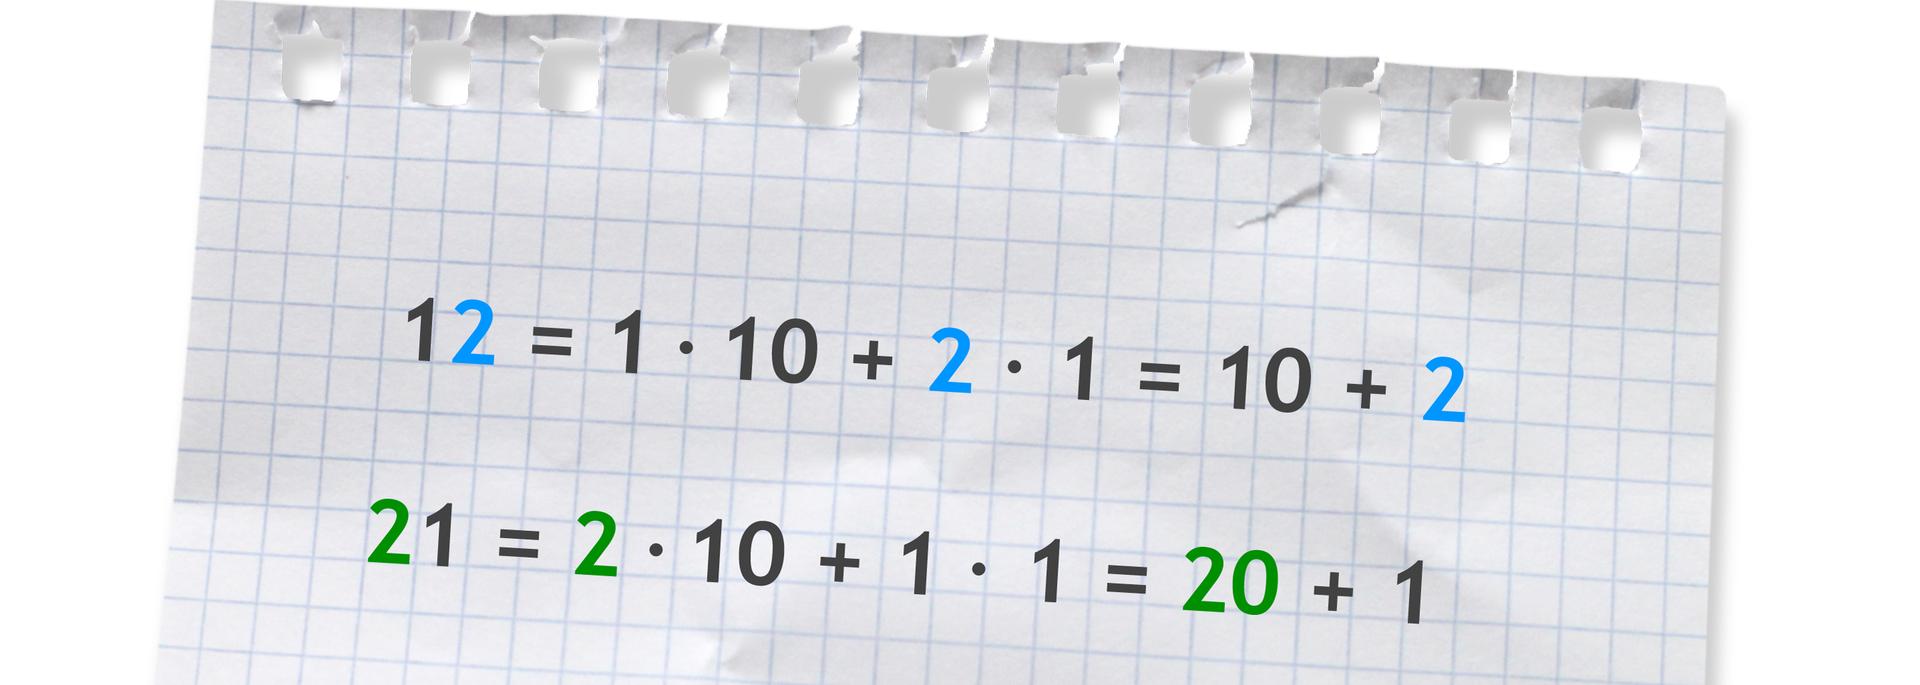 Liczba 12 =1 razy 10 +2 razy 1 =10 +2. Liczba 21 =2 razy 10 +1 razy 1 = 20 +1.